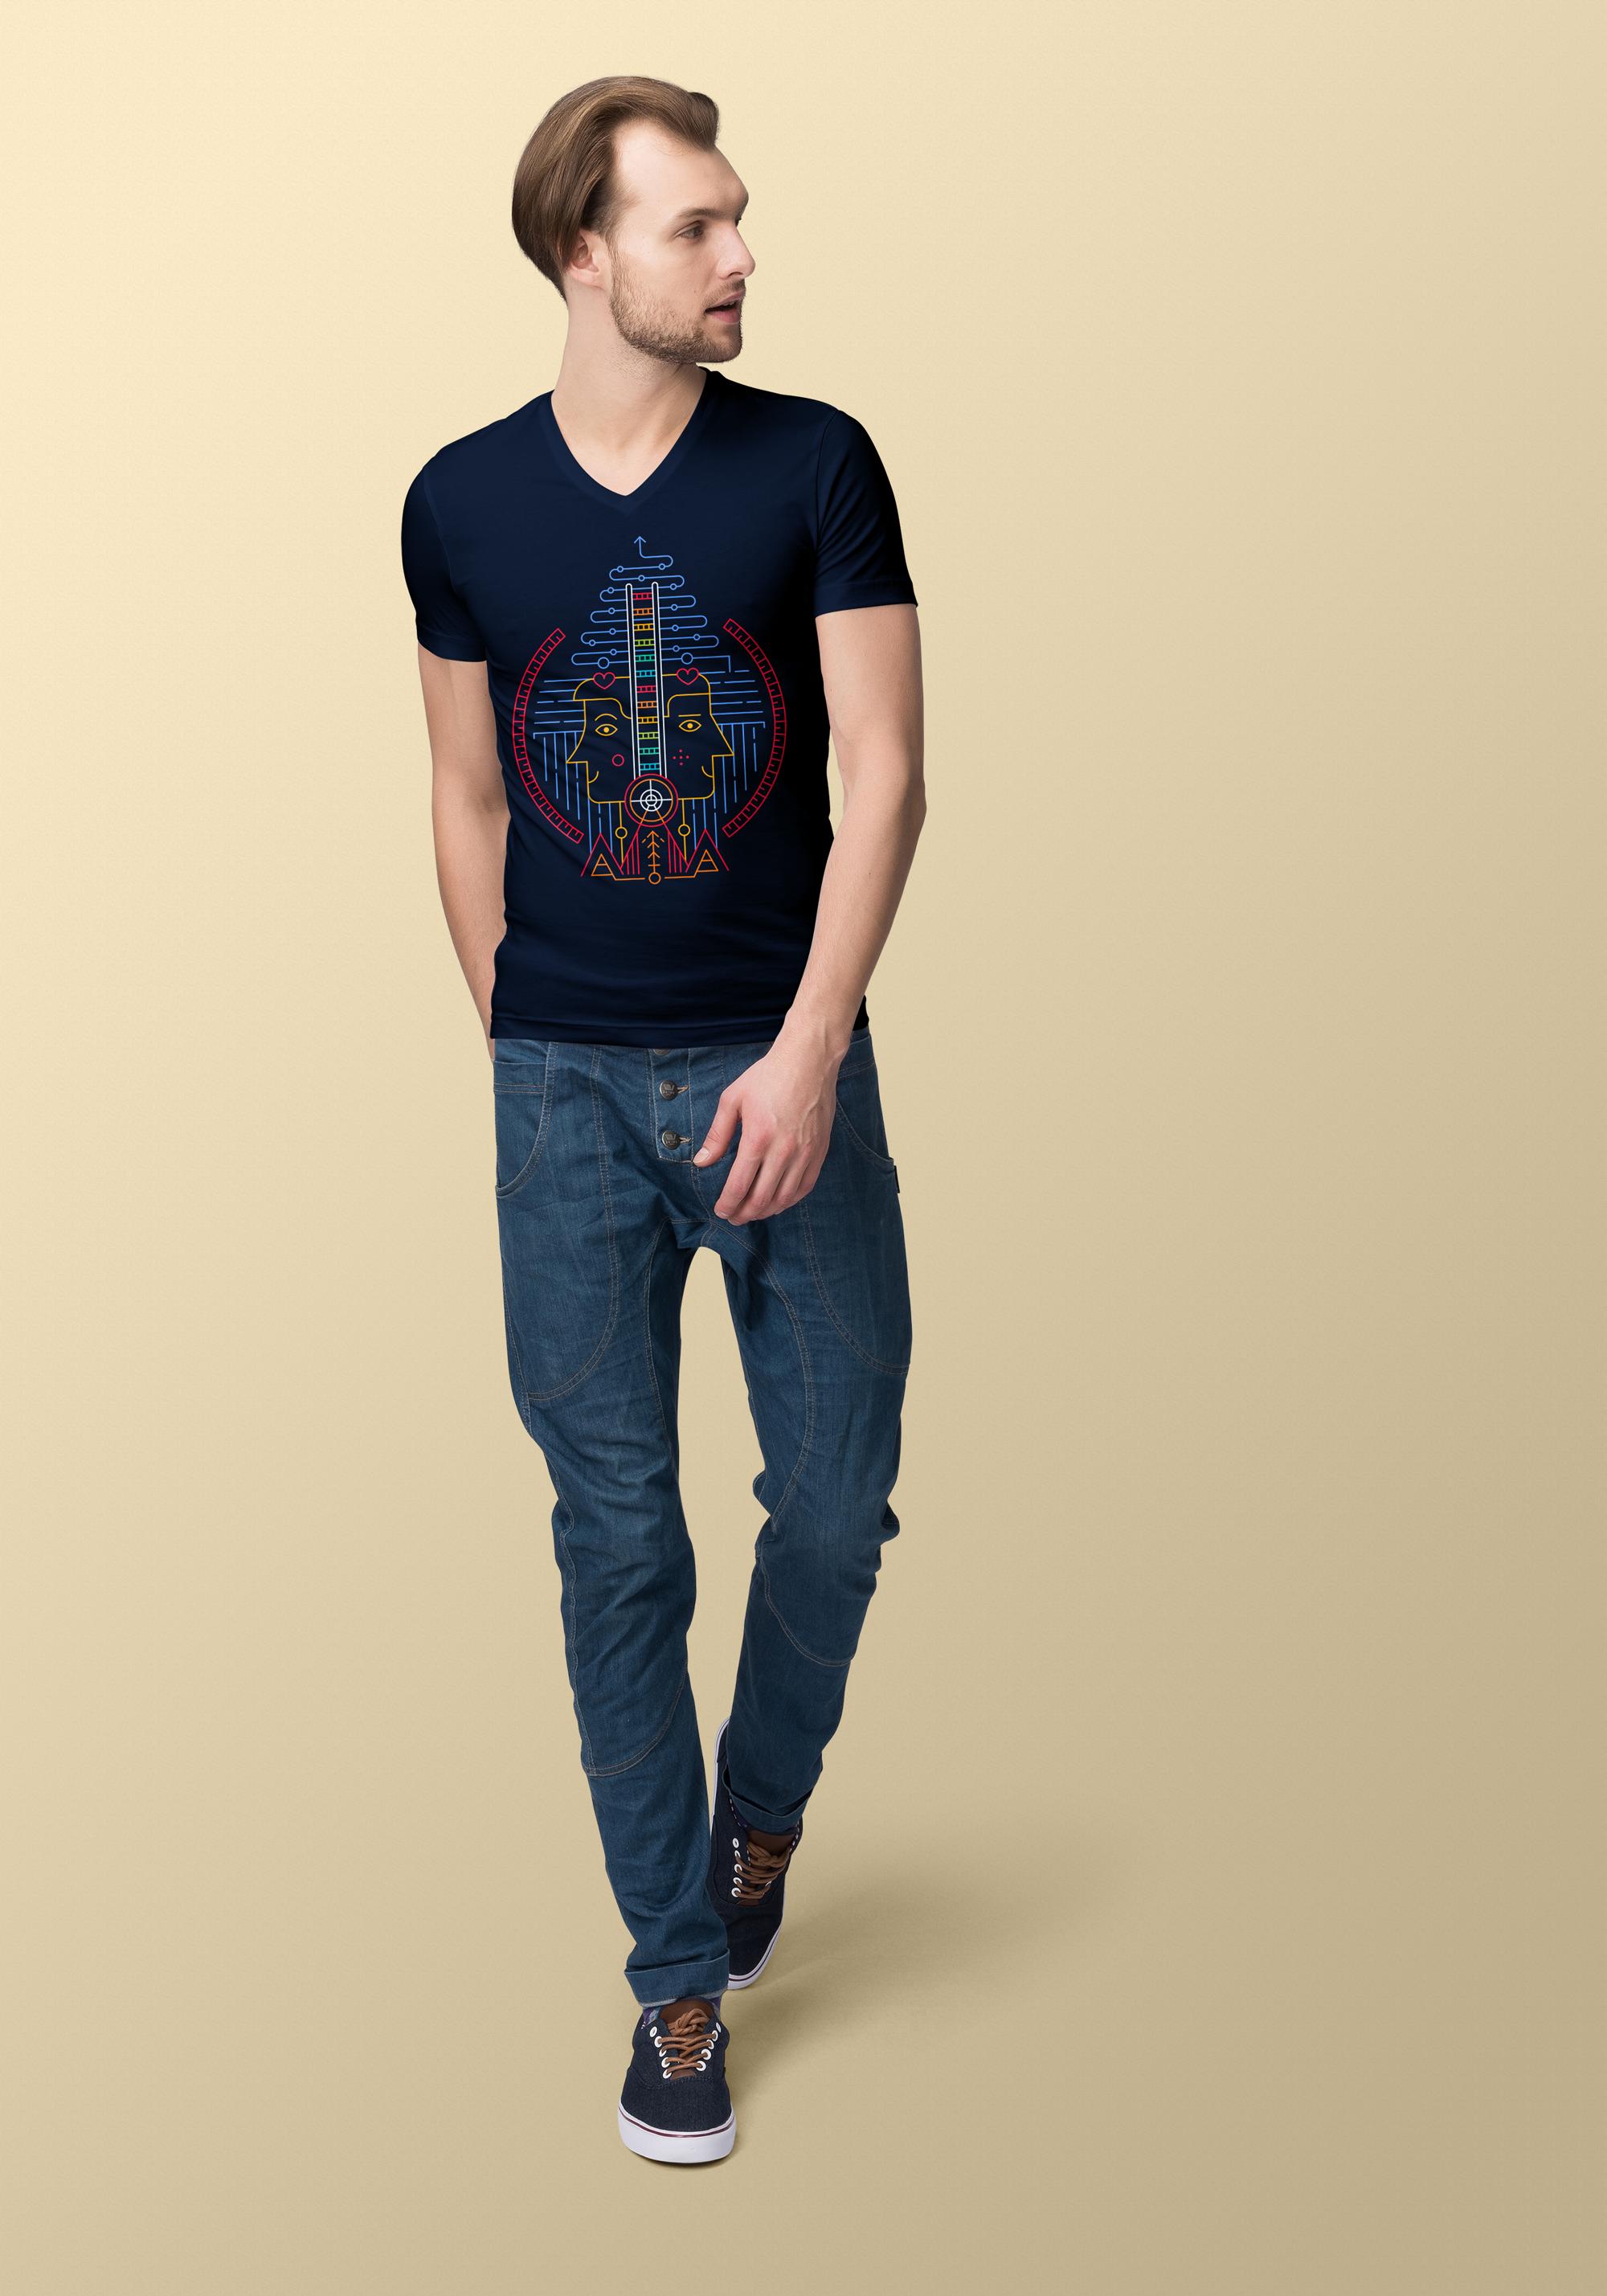 Ax brand brindes t shirt valores apply man 01